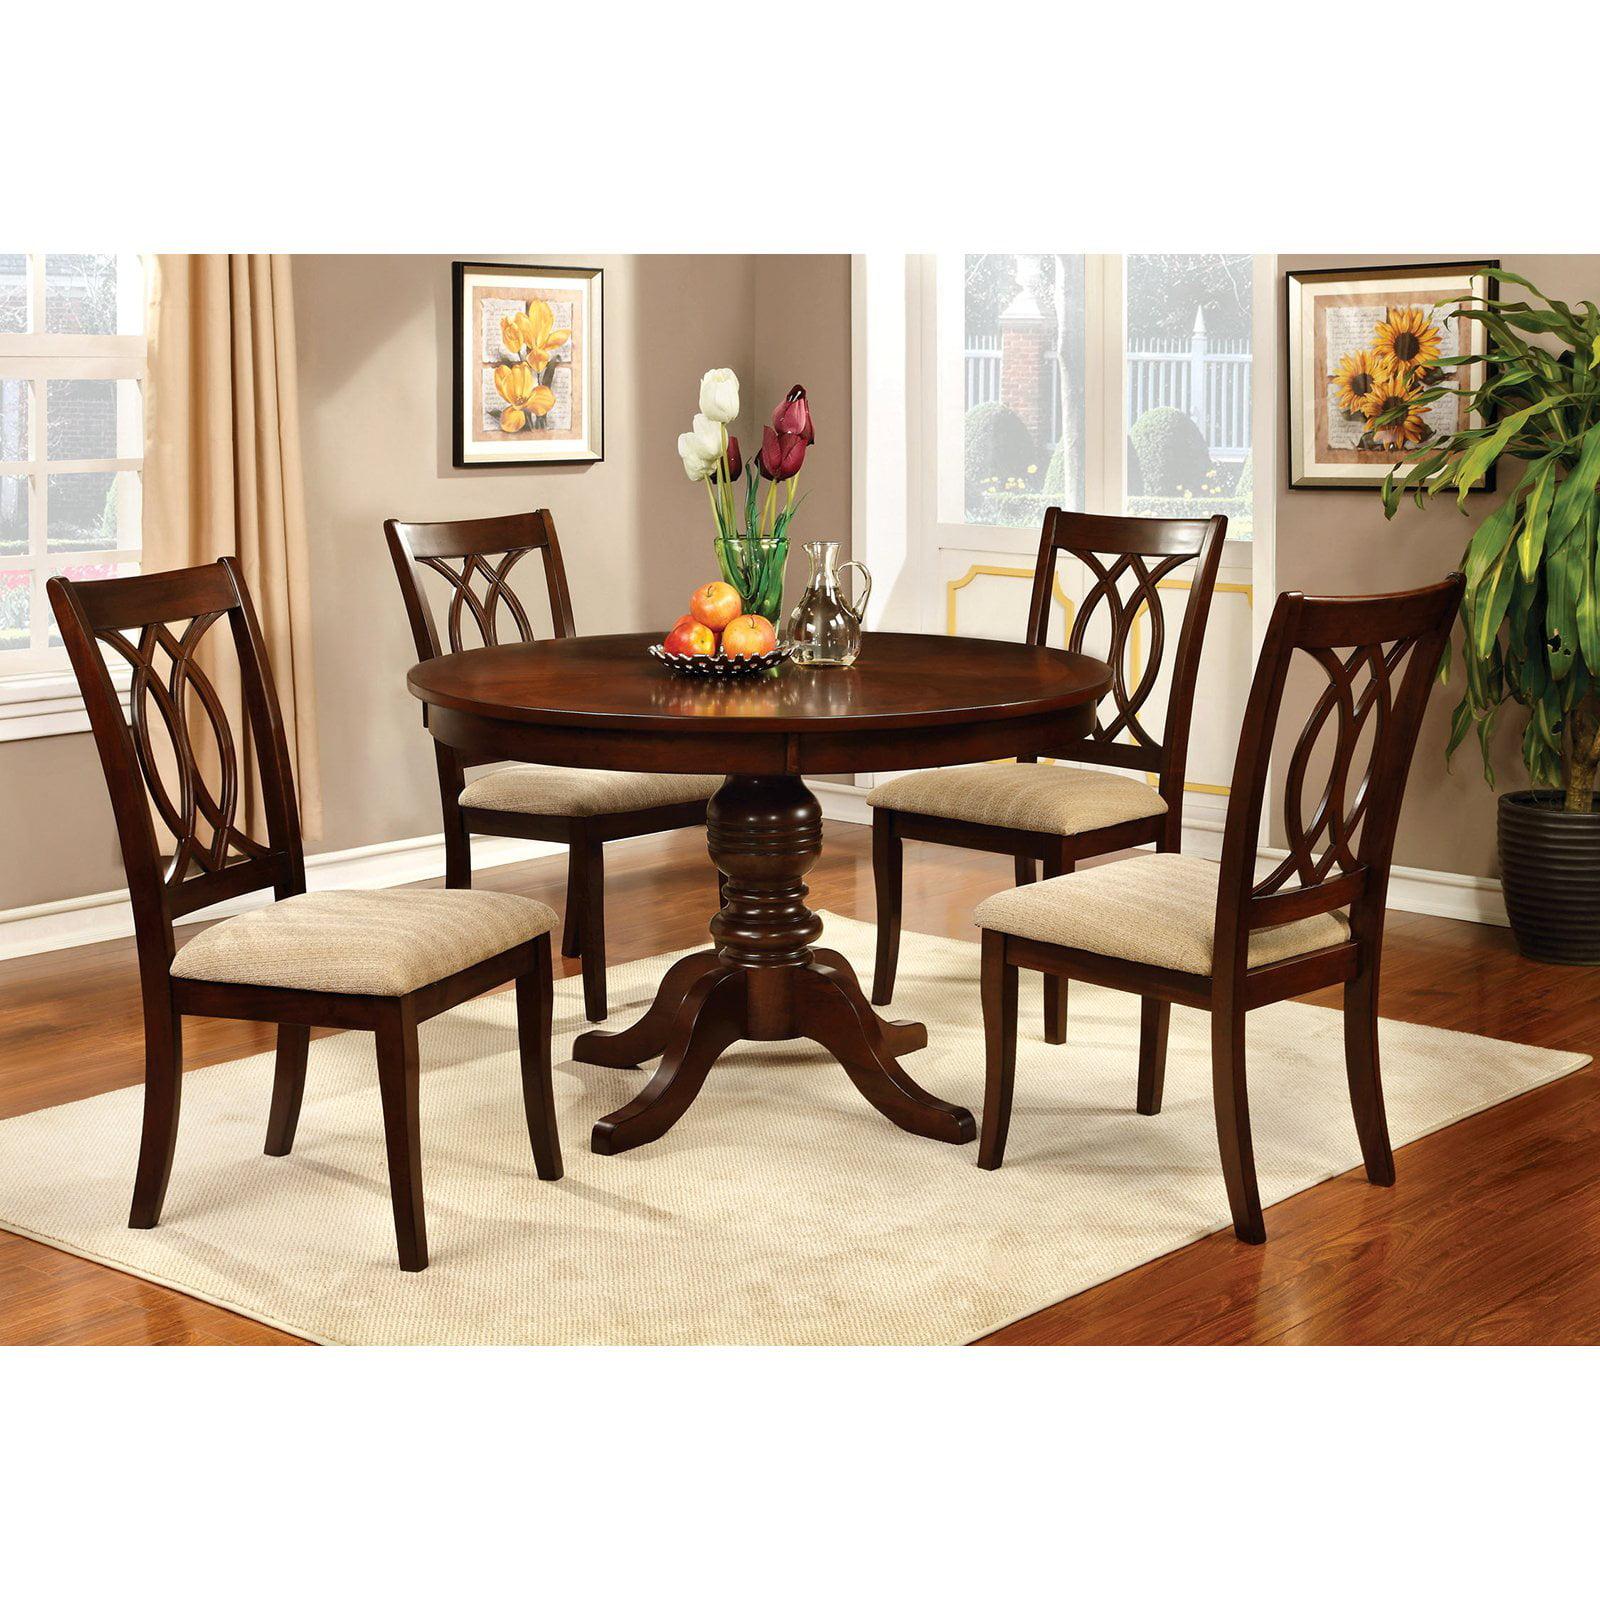 Brilliant Furniture Of America Frescina Round Dining Table Download Free Architecture Designs Rallybritishbridgeorg